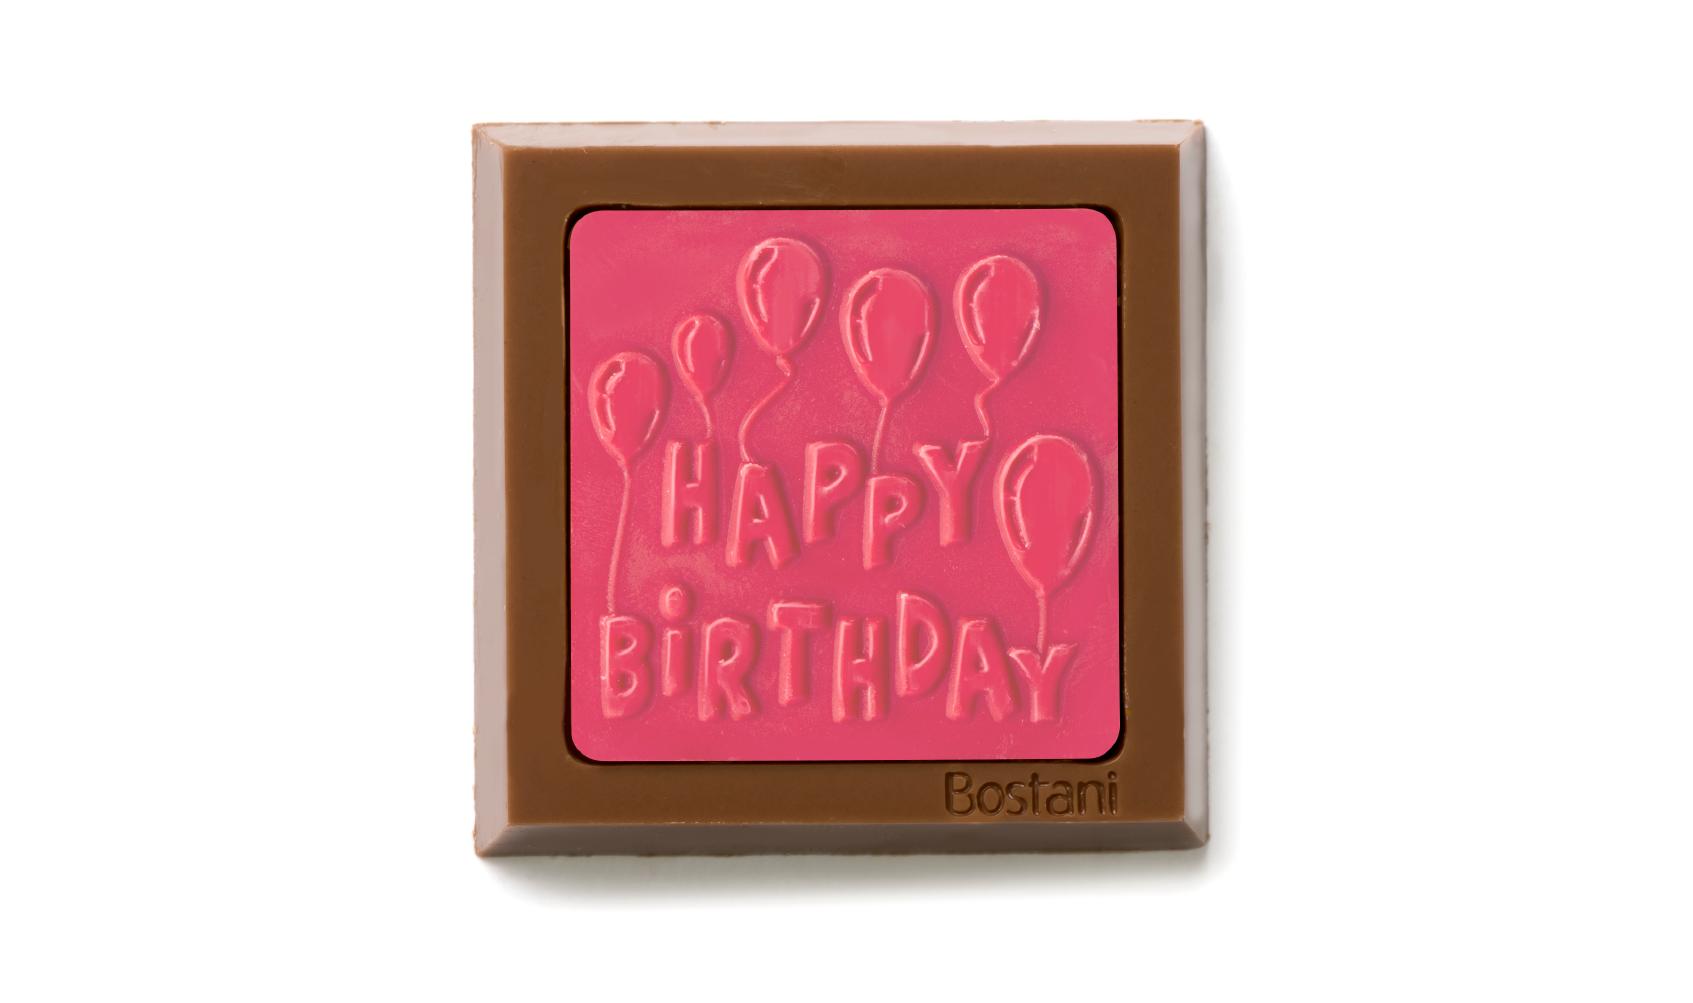 Happy birthday Pink Color 100g